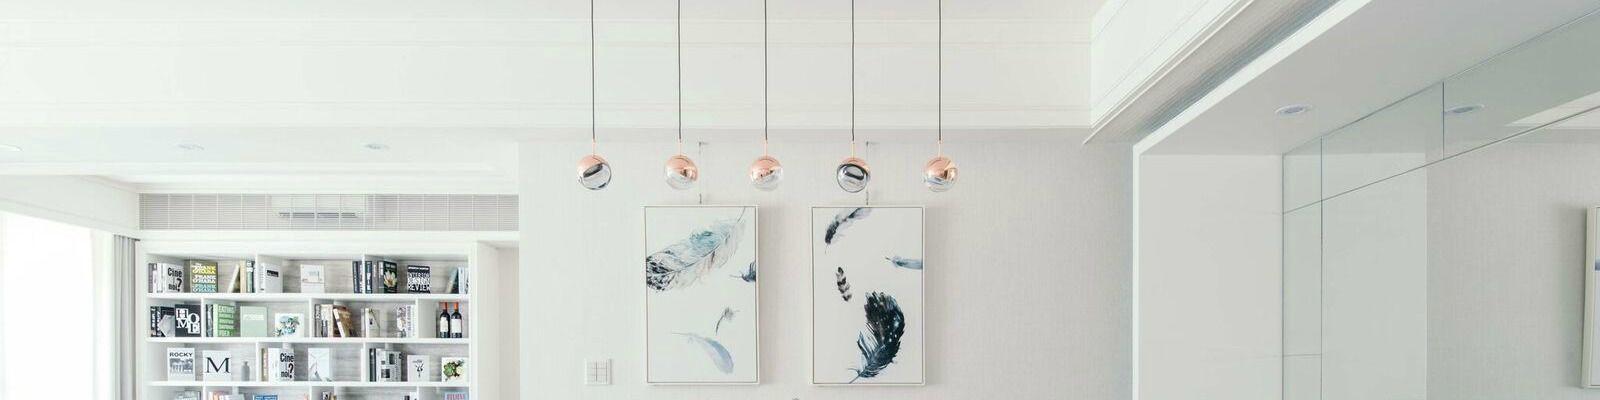 Lamps Online